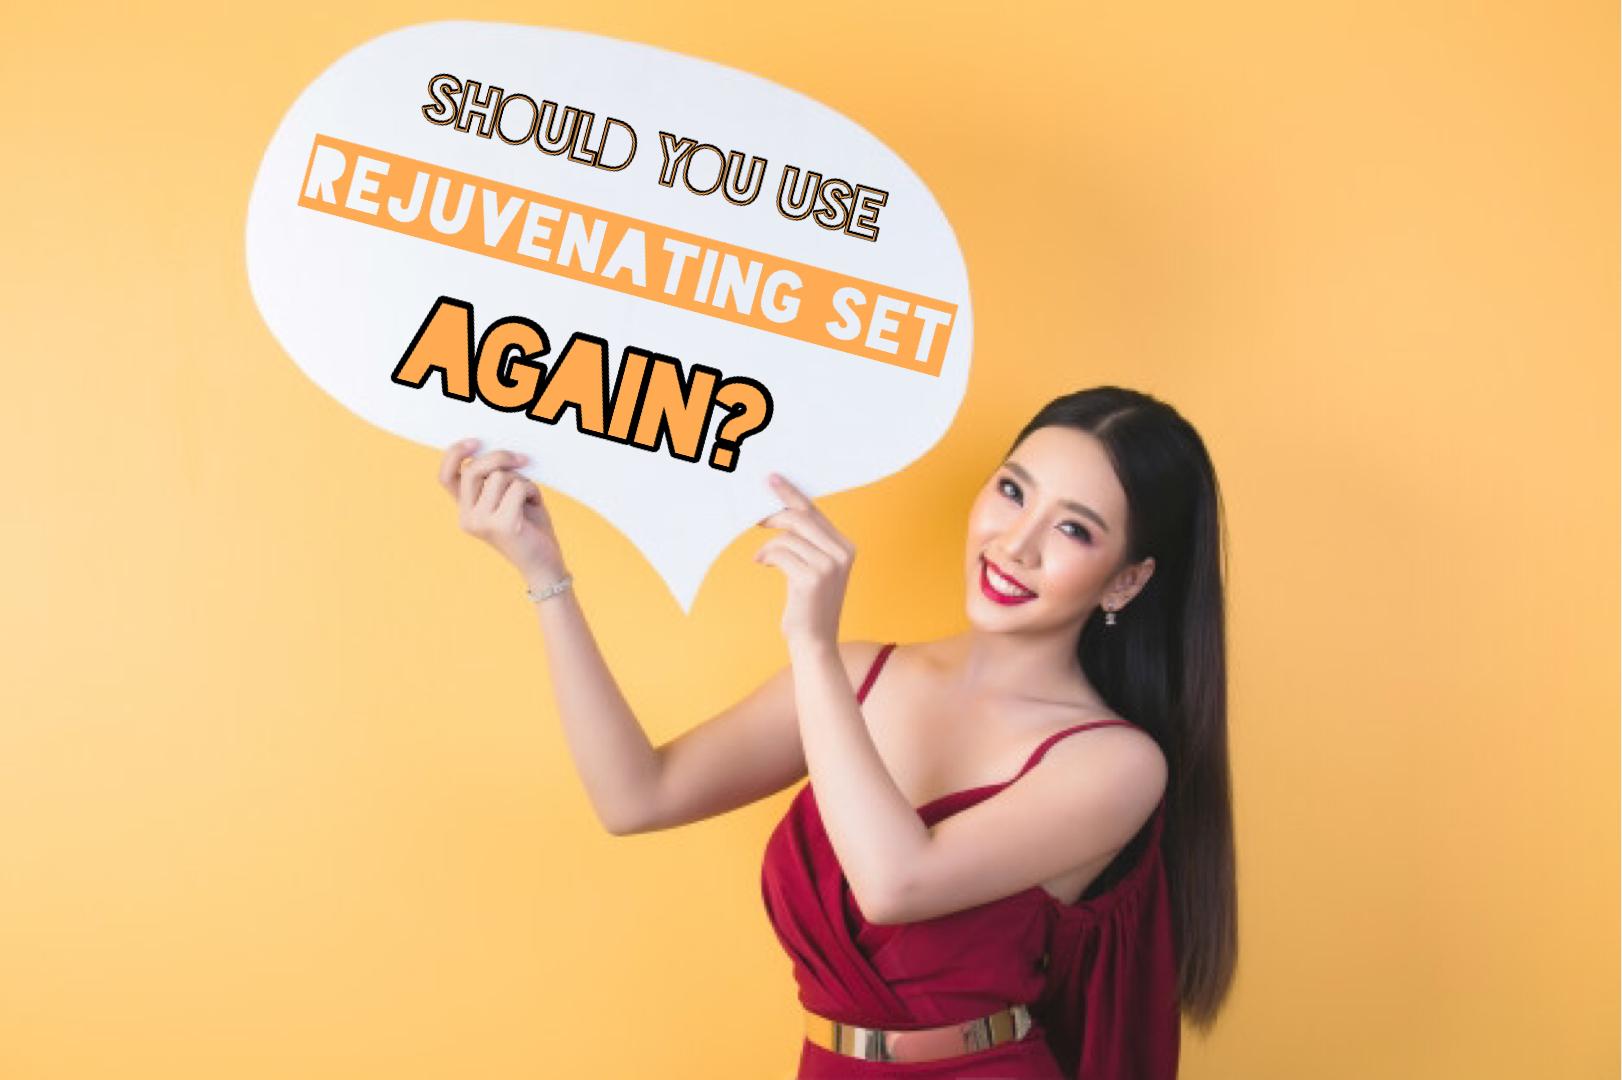 Should you use rejuvenating set again